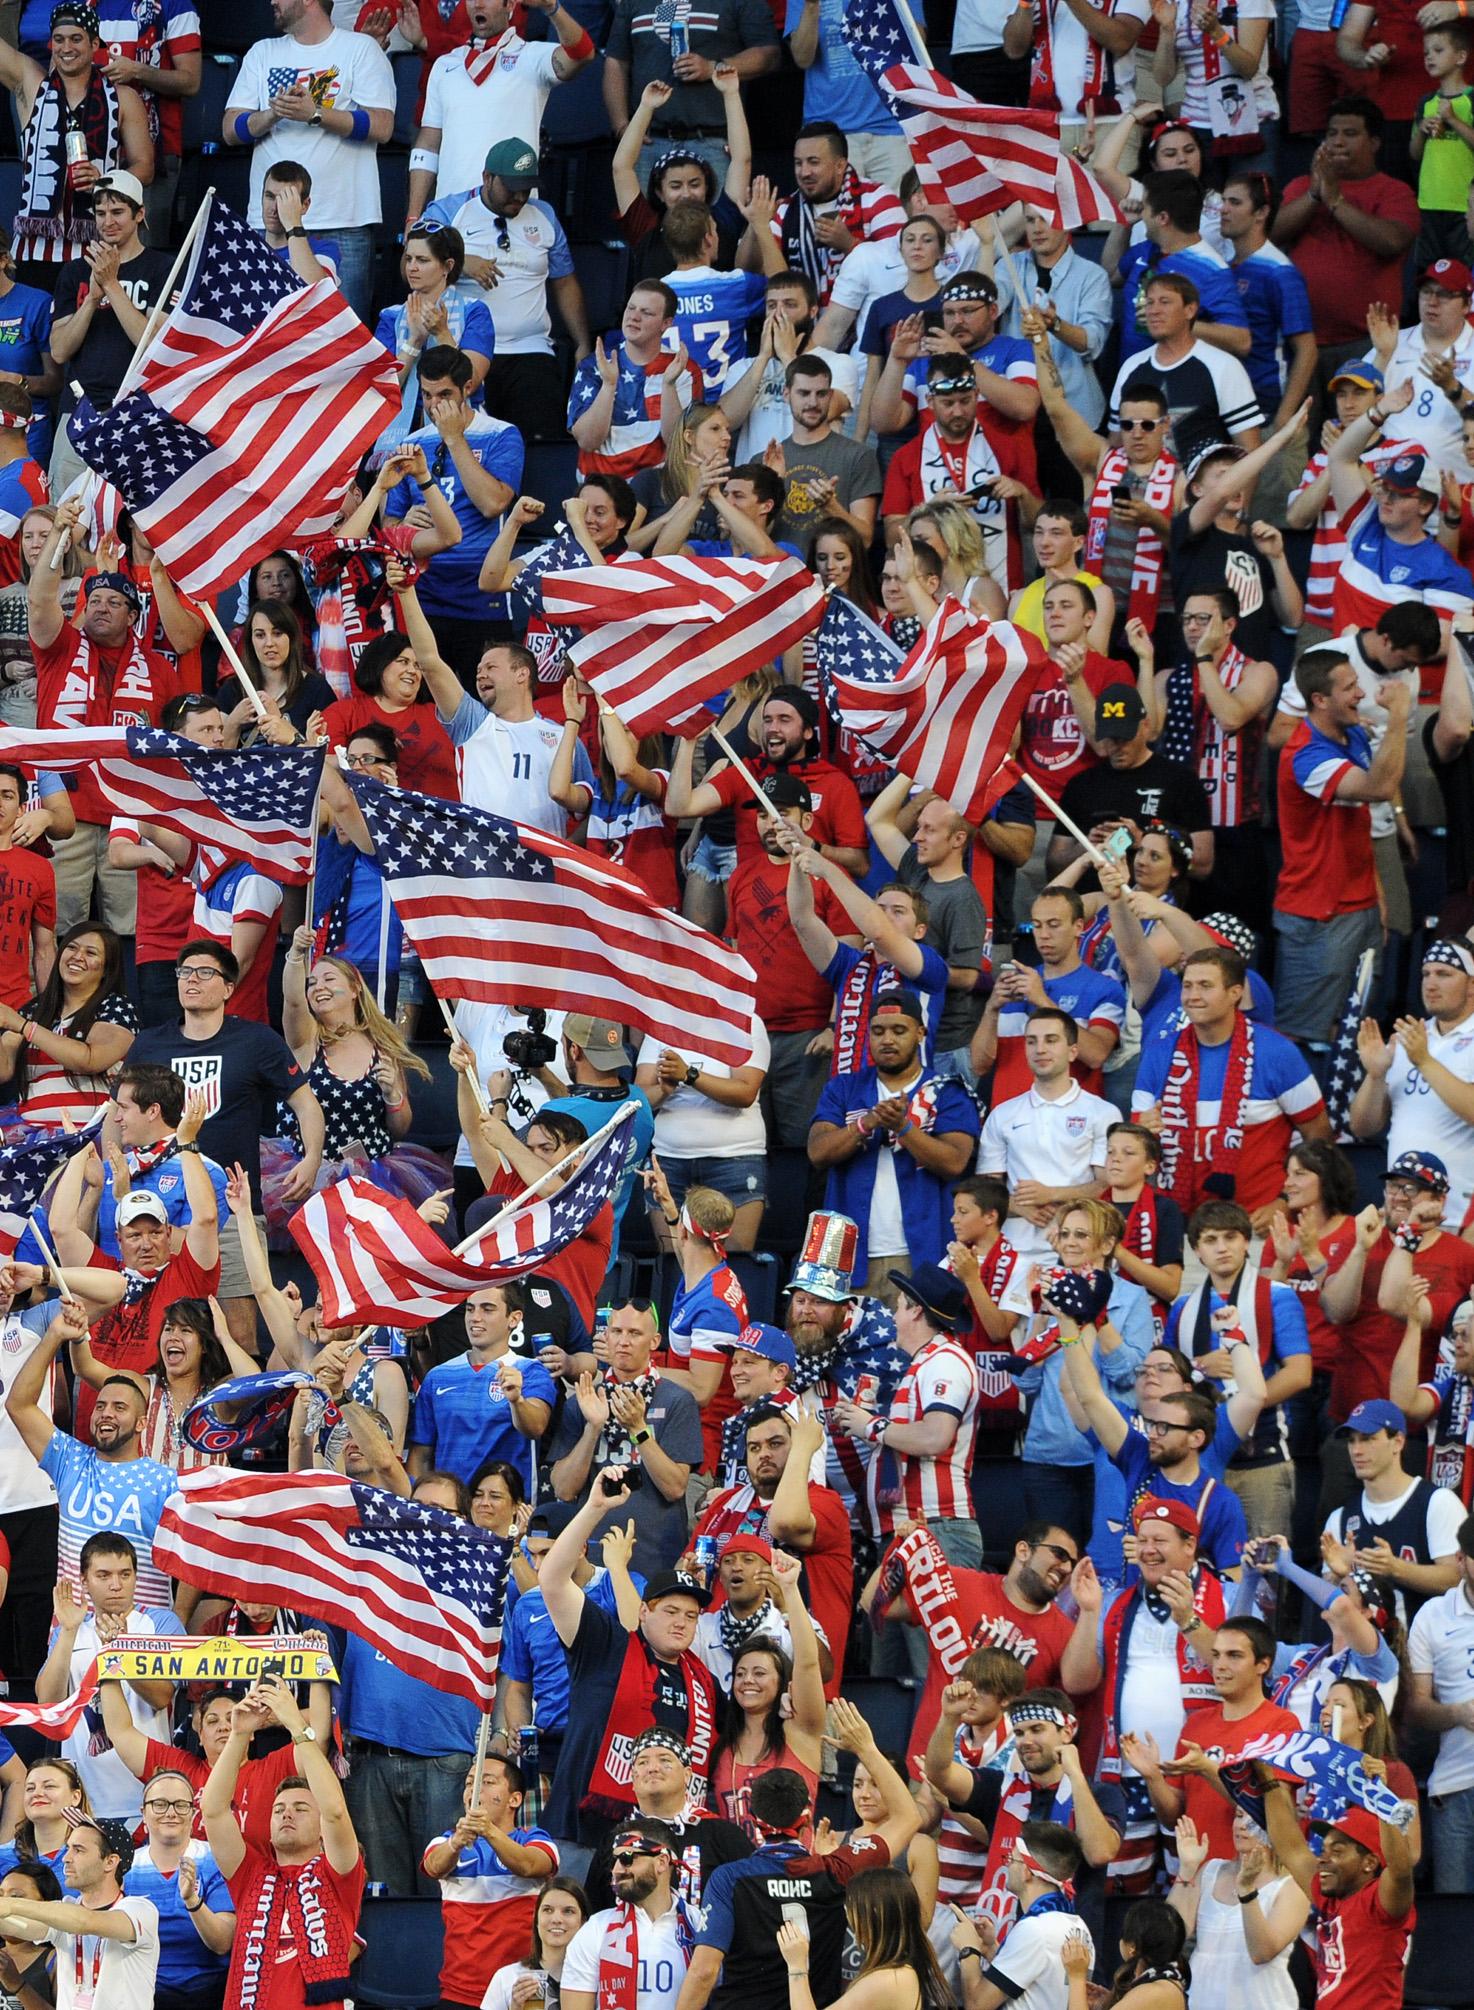 U.S. Soccer Fans In Stadium